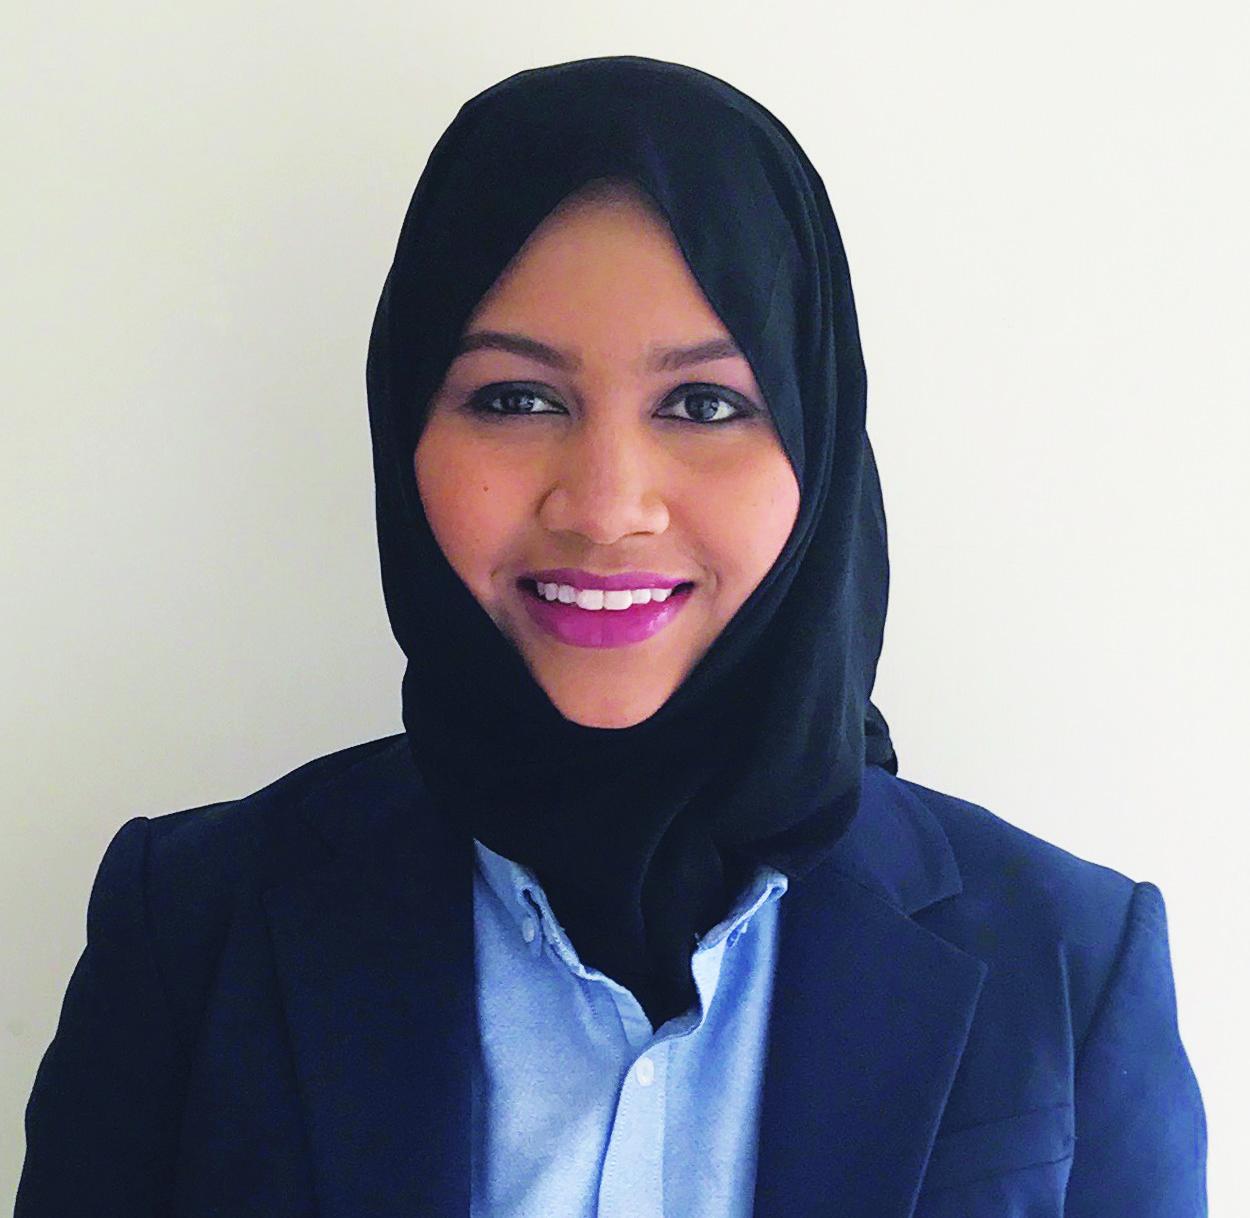 Nilfat Ali (Kenya)